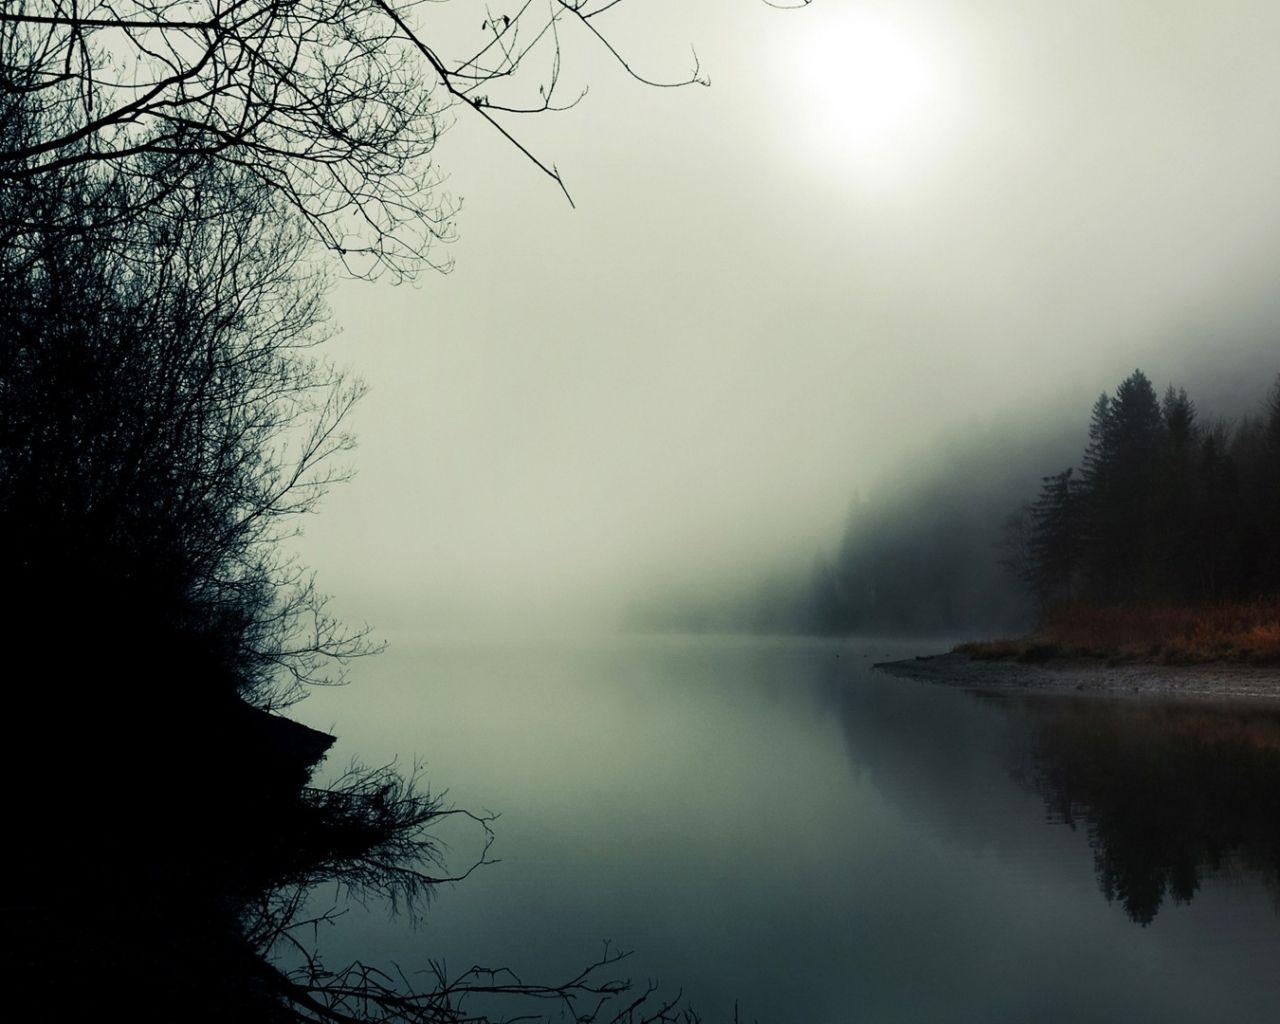 mystical wallpaper 1920x1080 Foggy forest, Scenery